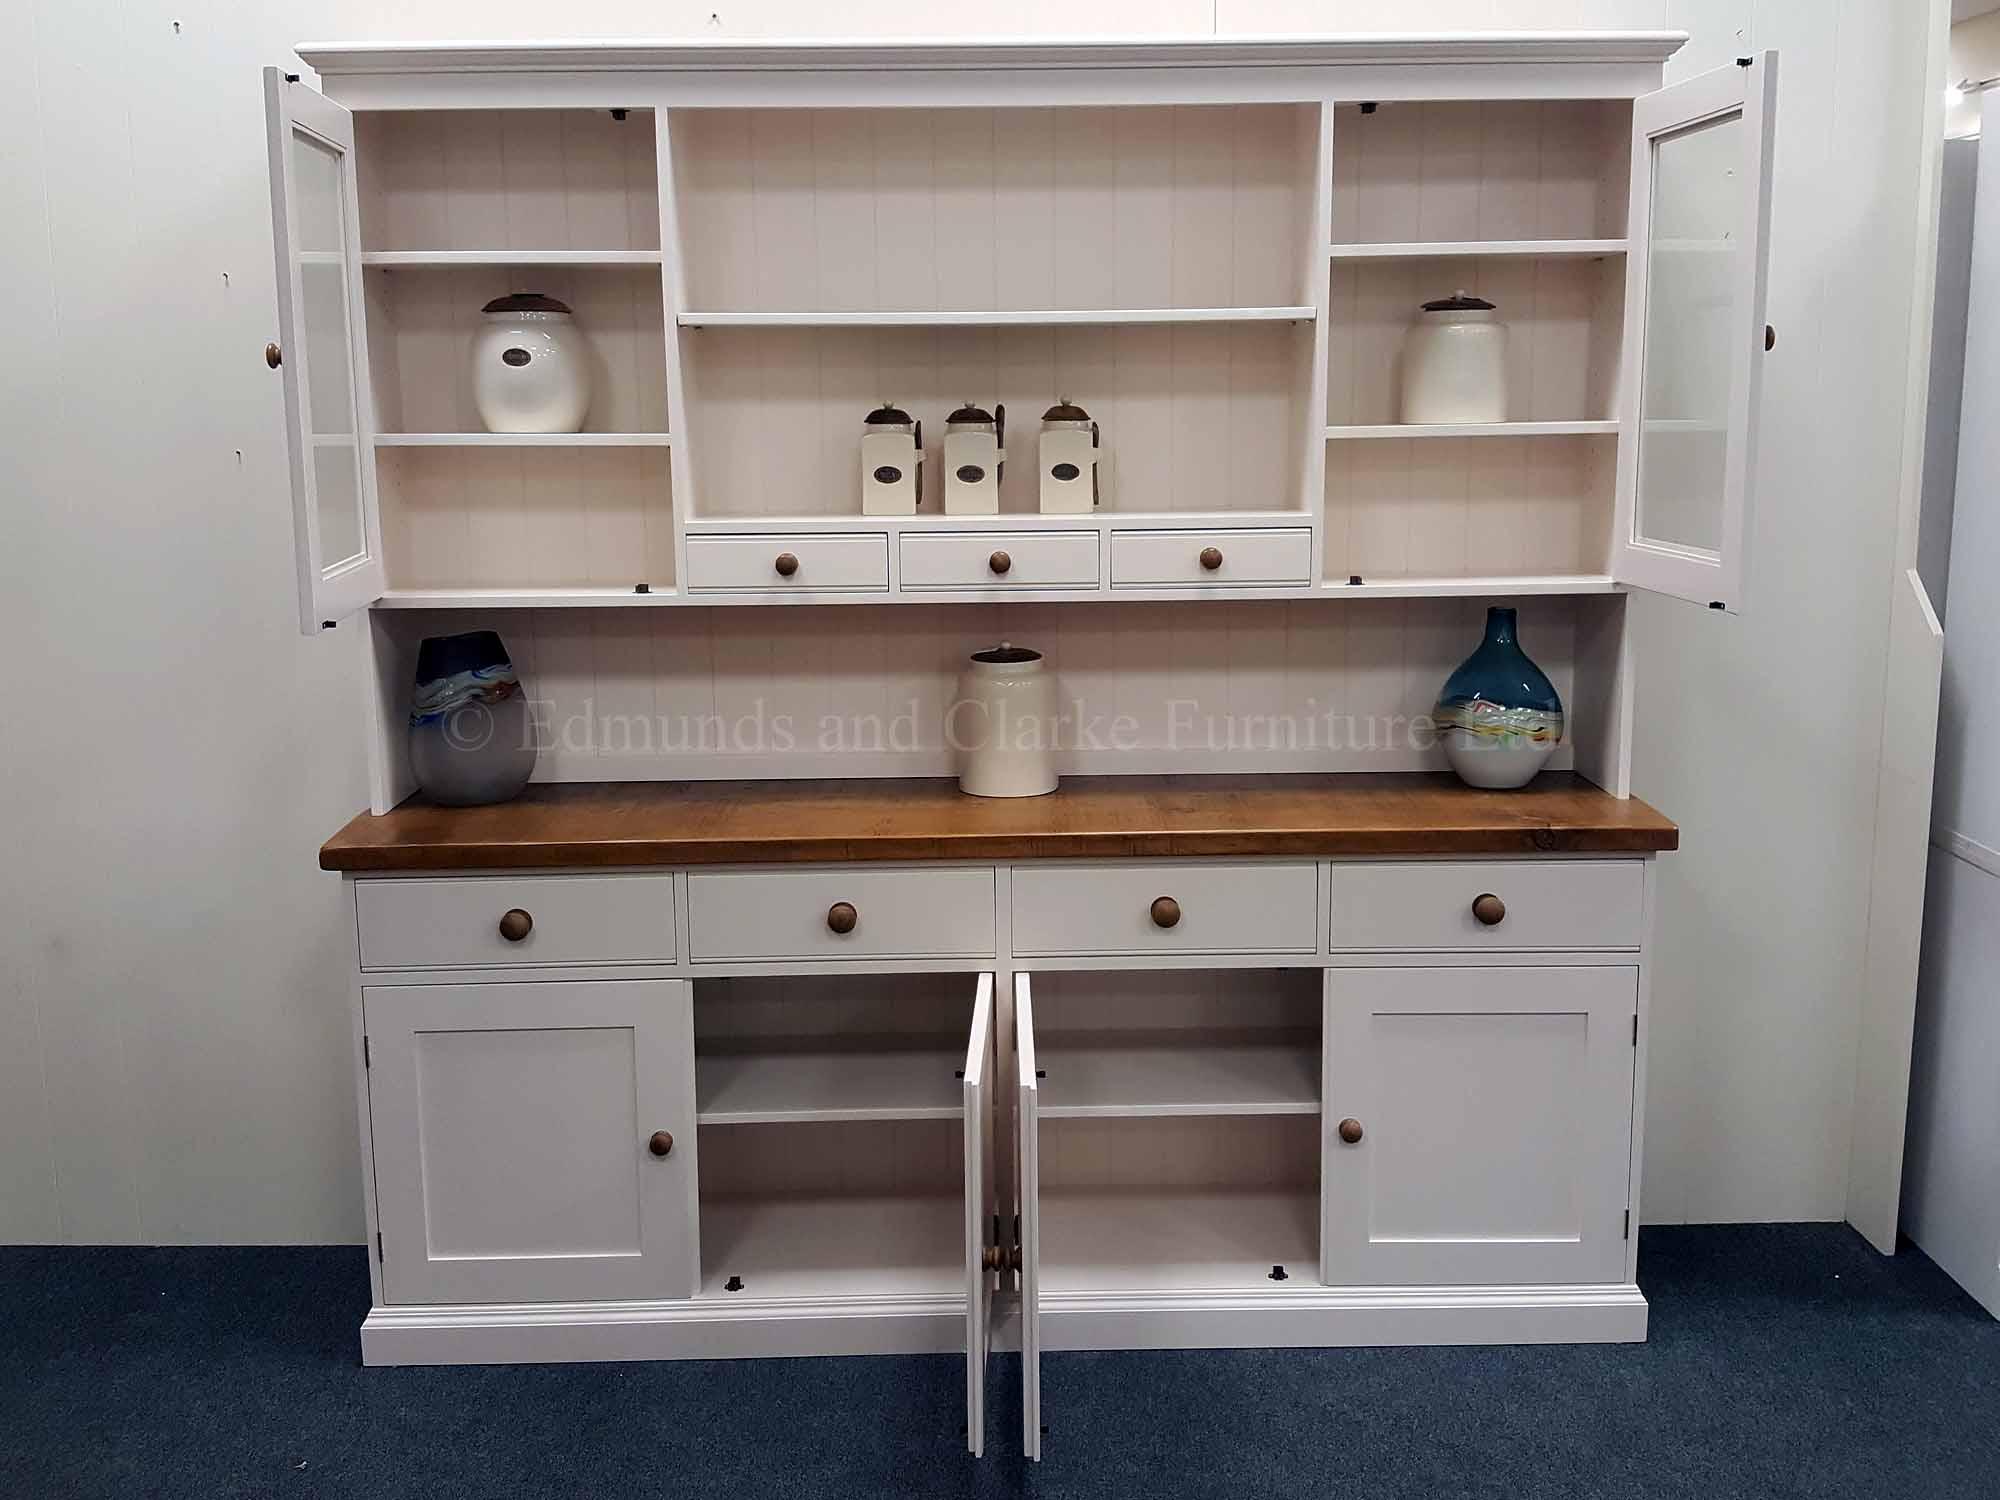 7ft plain painted kitchen dresser, choose your paint colour and tops